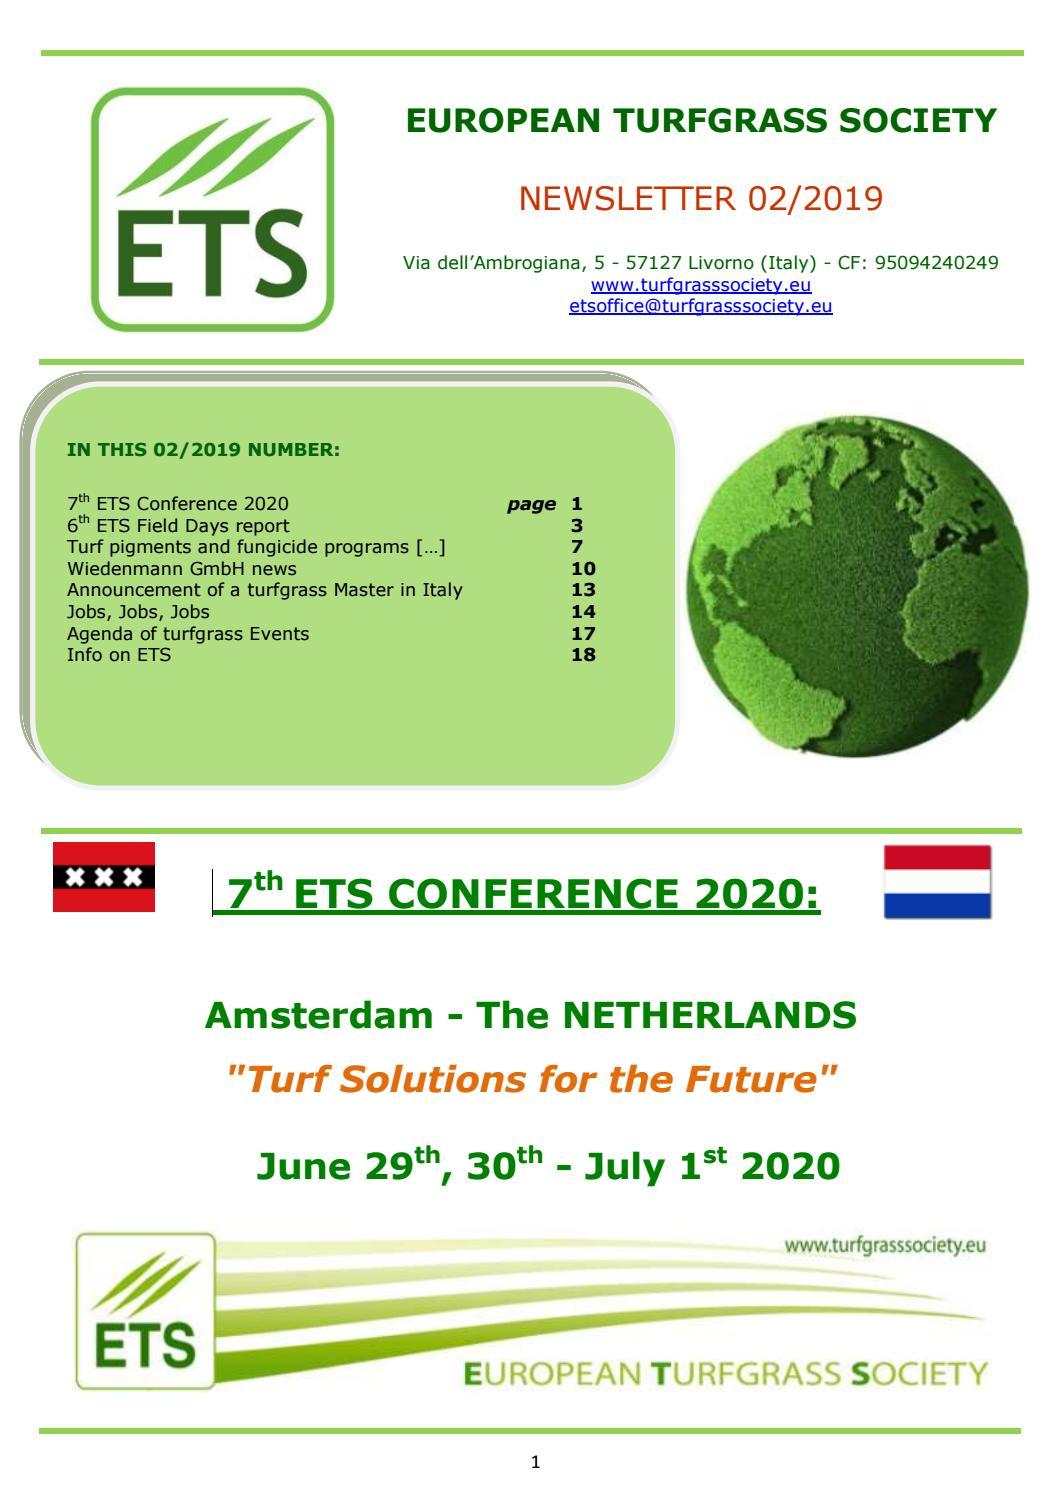 ETS NEWSLETTER 02-2019 by European Turfgrass Society - issuu